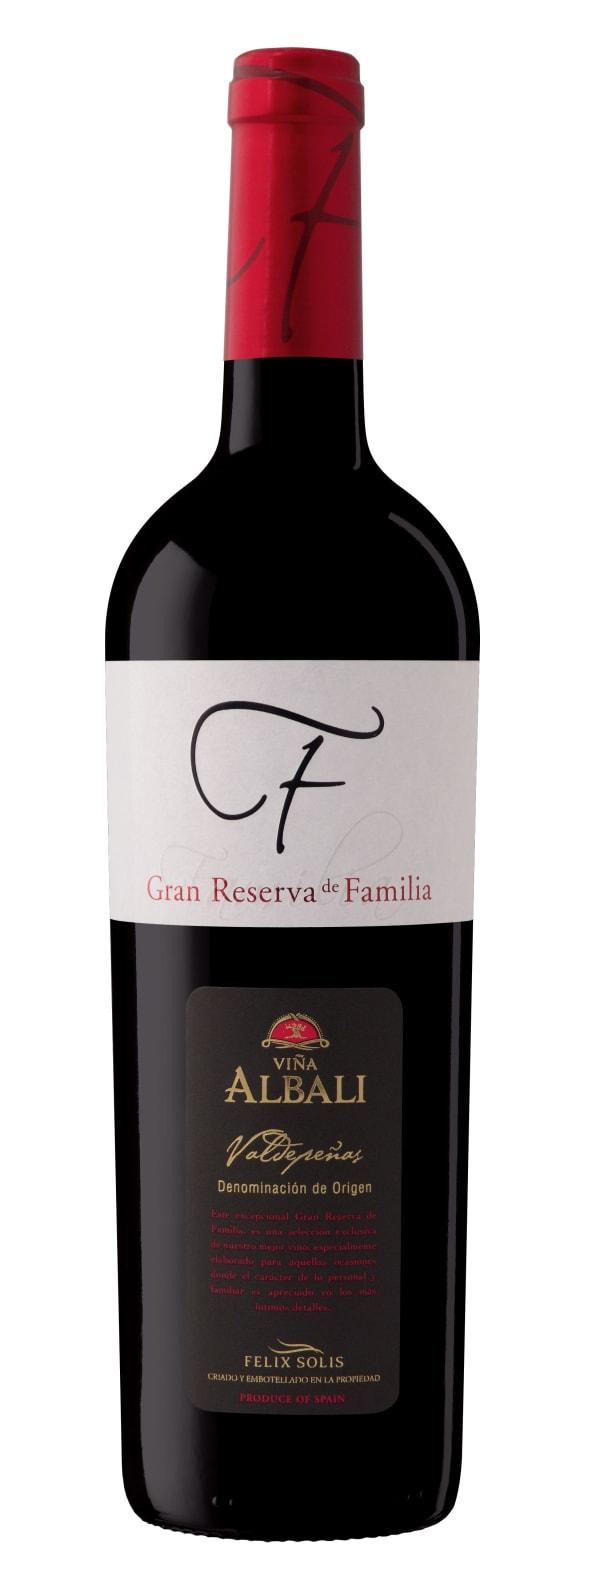 Viña Albali Gran Reserva de Familia 2006